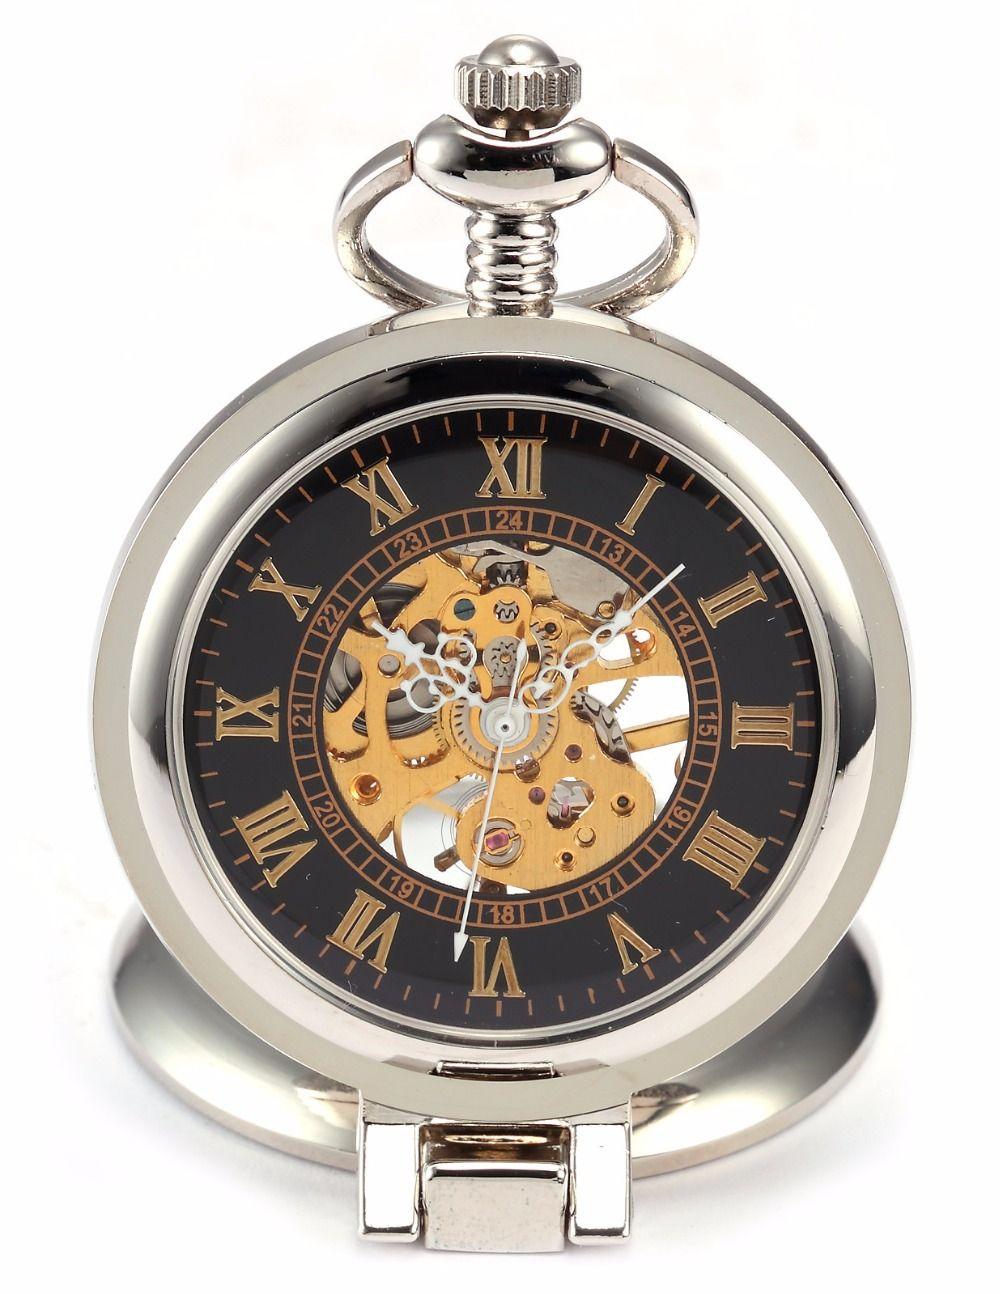 Retro moda plata negro lupa caja mecánica mano Winding hombres romana analógica cadena regalo reloj colgante reloj de bolsillo/WPK023